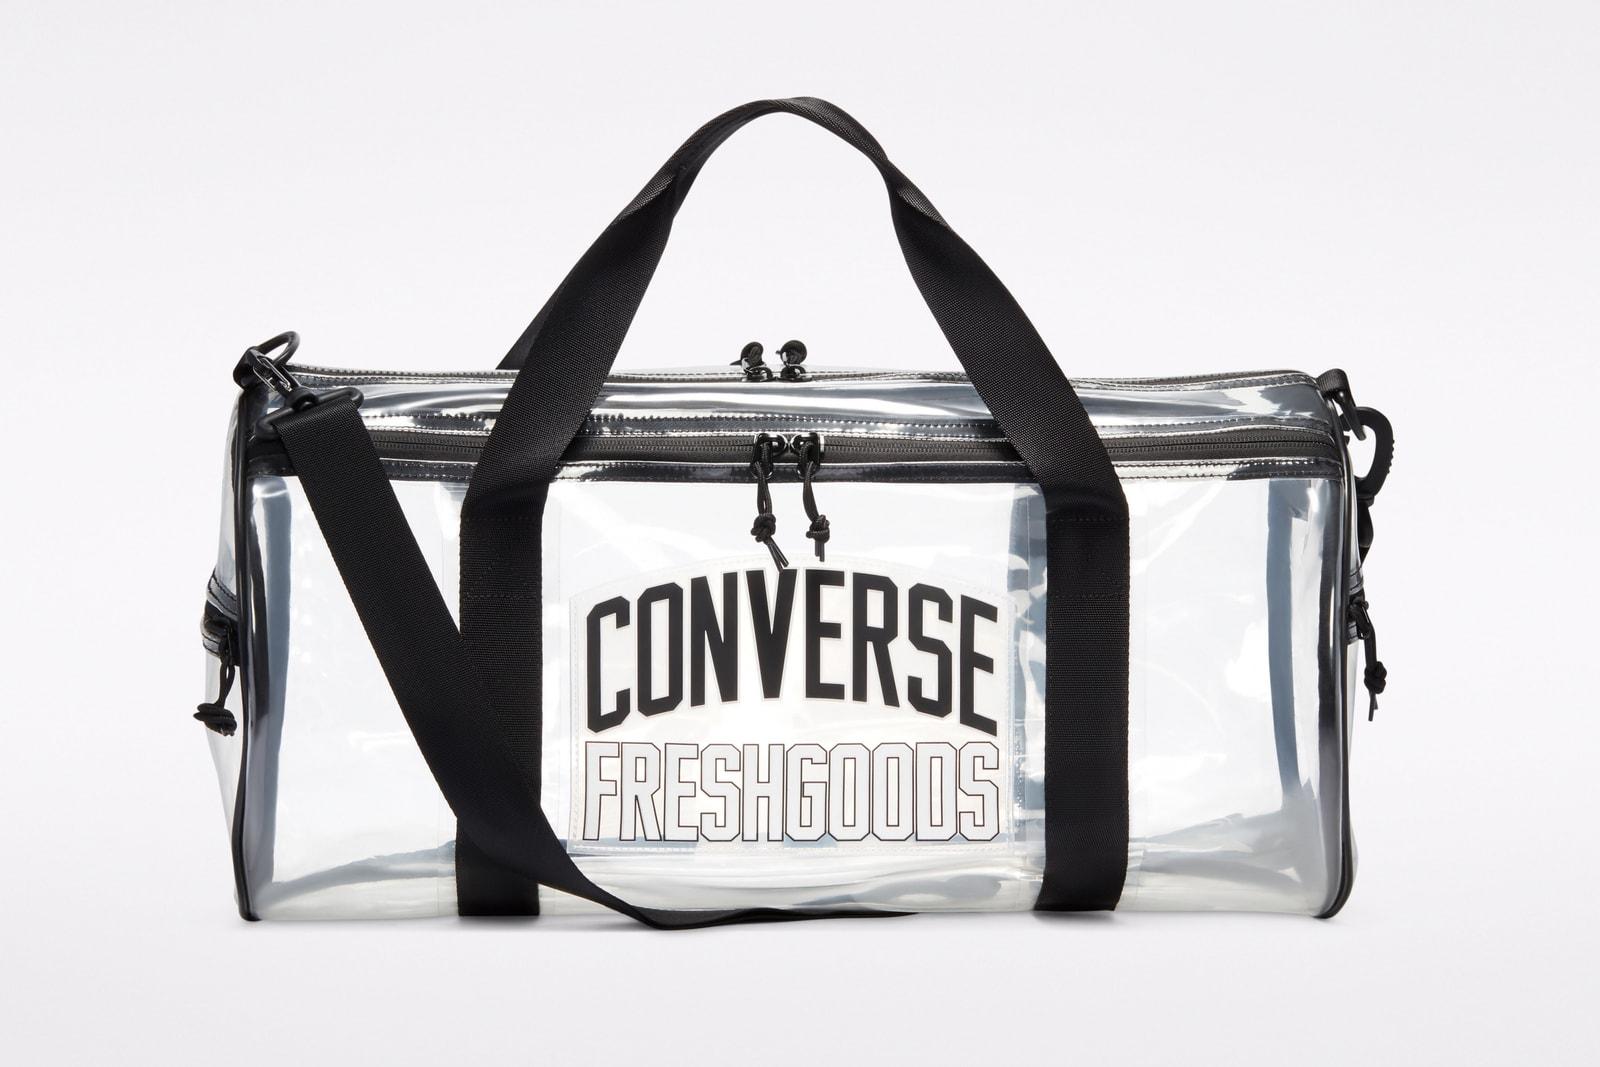 Converse  携手 Joe Freshgoods 致敬打造全新联名系列